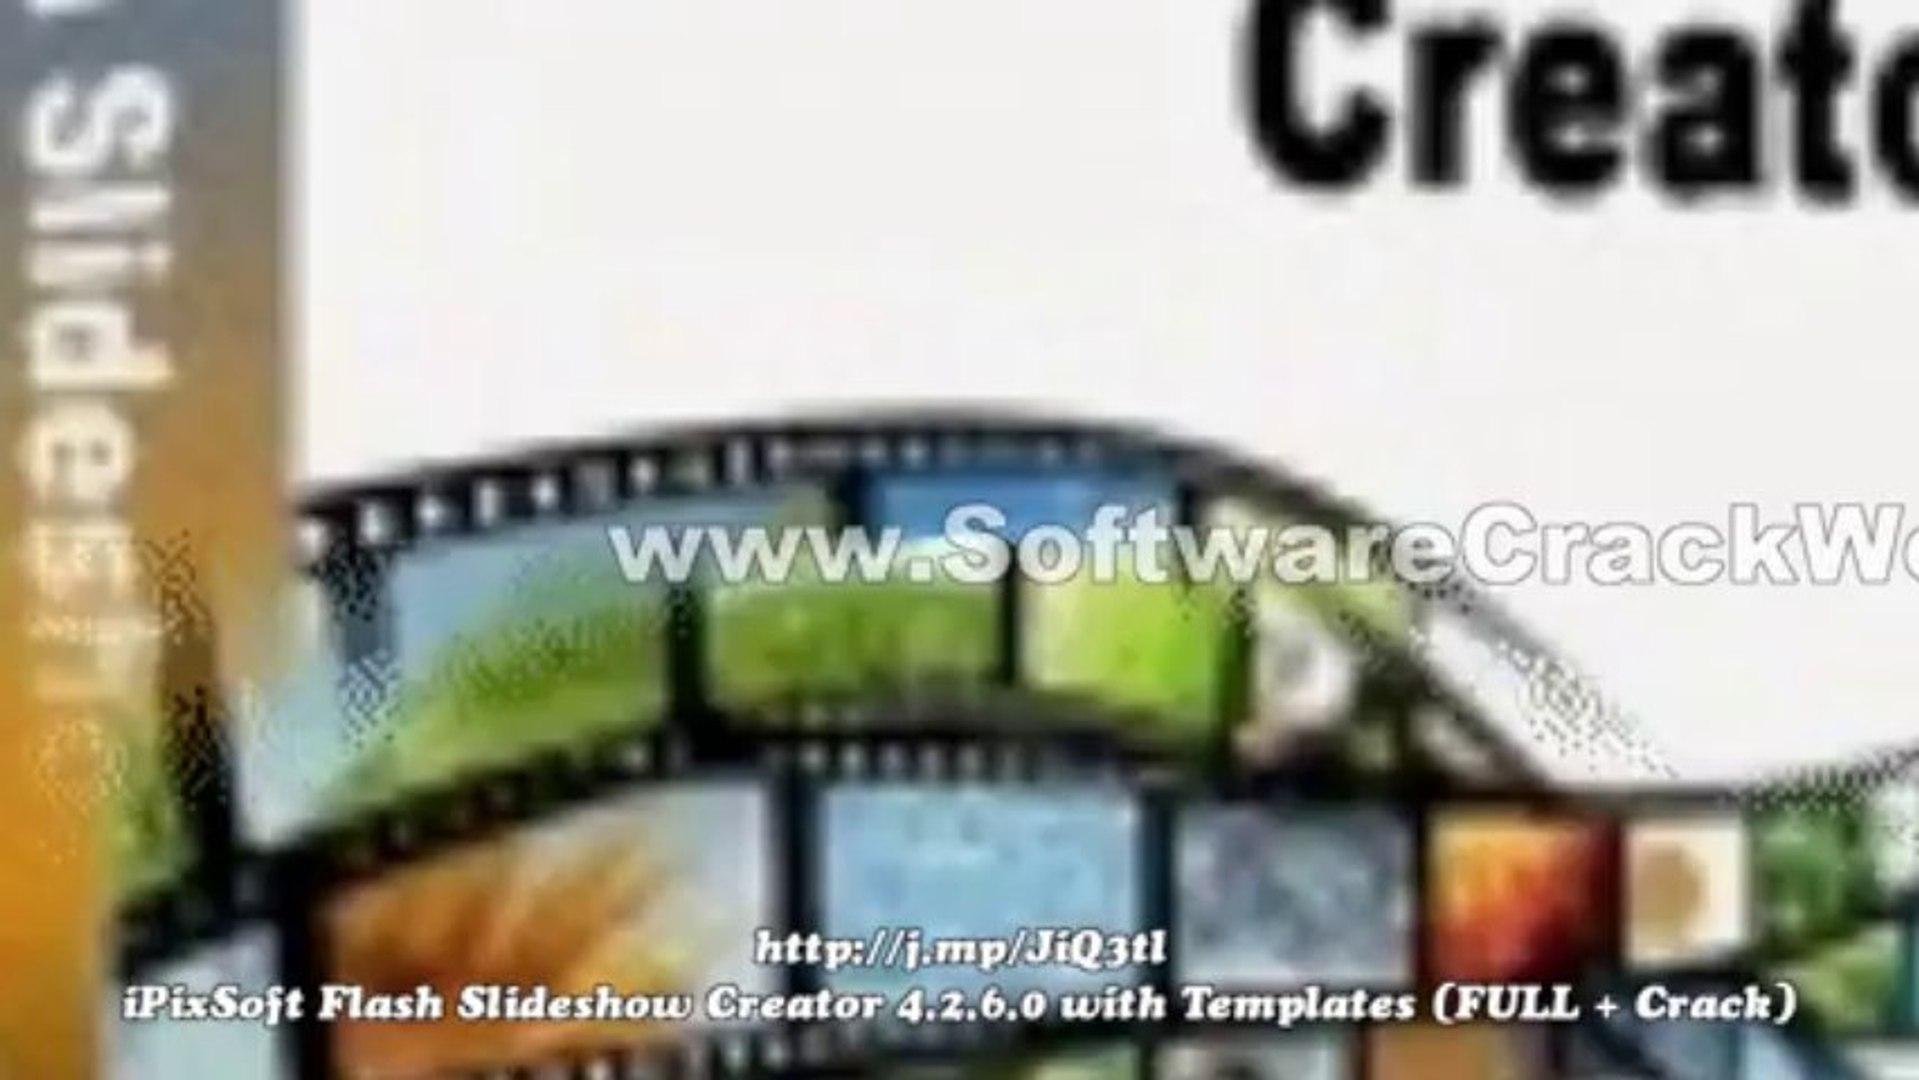 iPixSoft Flash Slideshow Creator 4 2 6 0 with Templates (FULL + Crack)